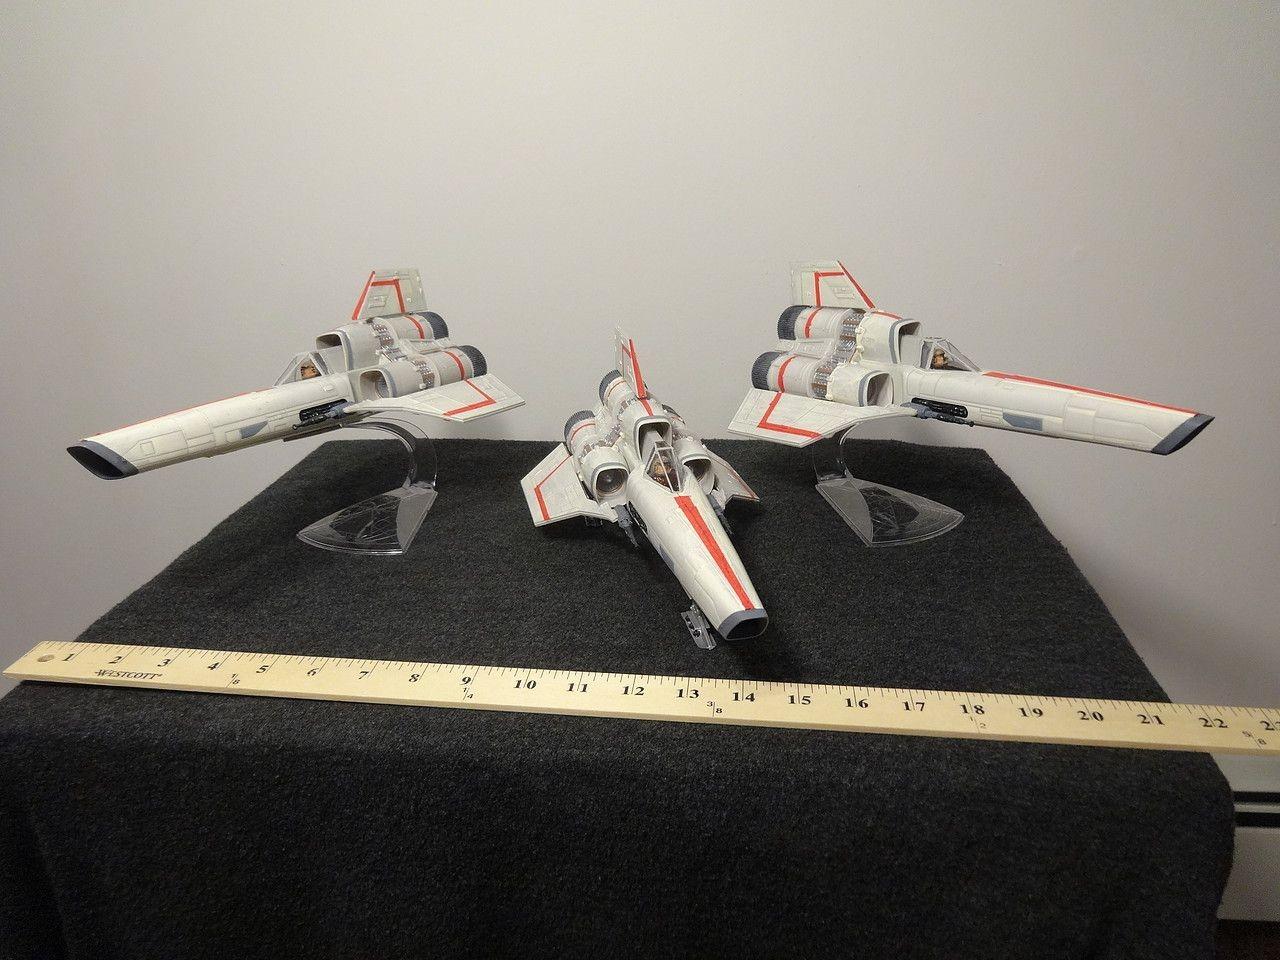 Battlestar Galactica Papercraft Battlestar Galactica original Mki Viper Plastic Model Kit In 1 32